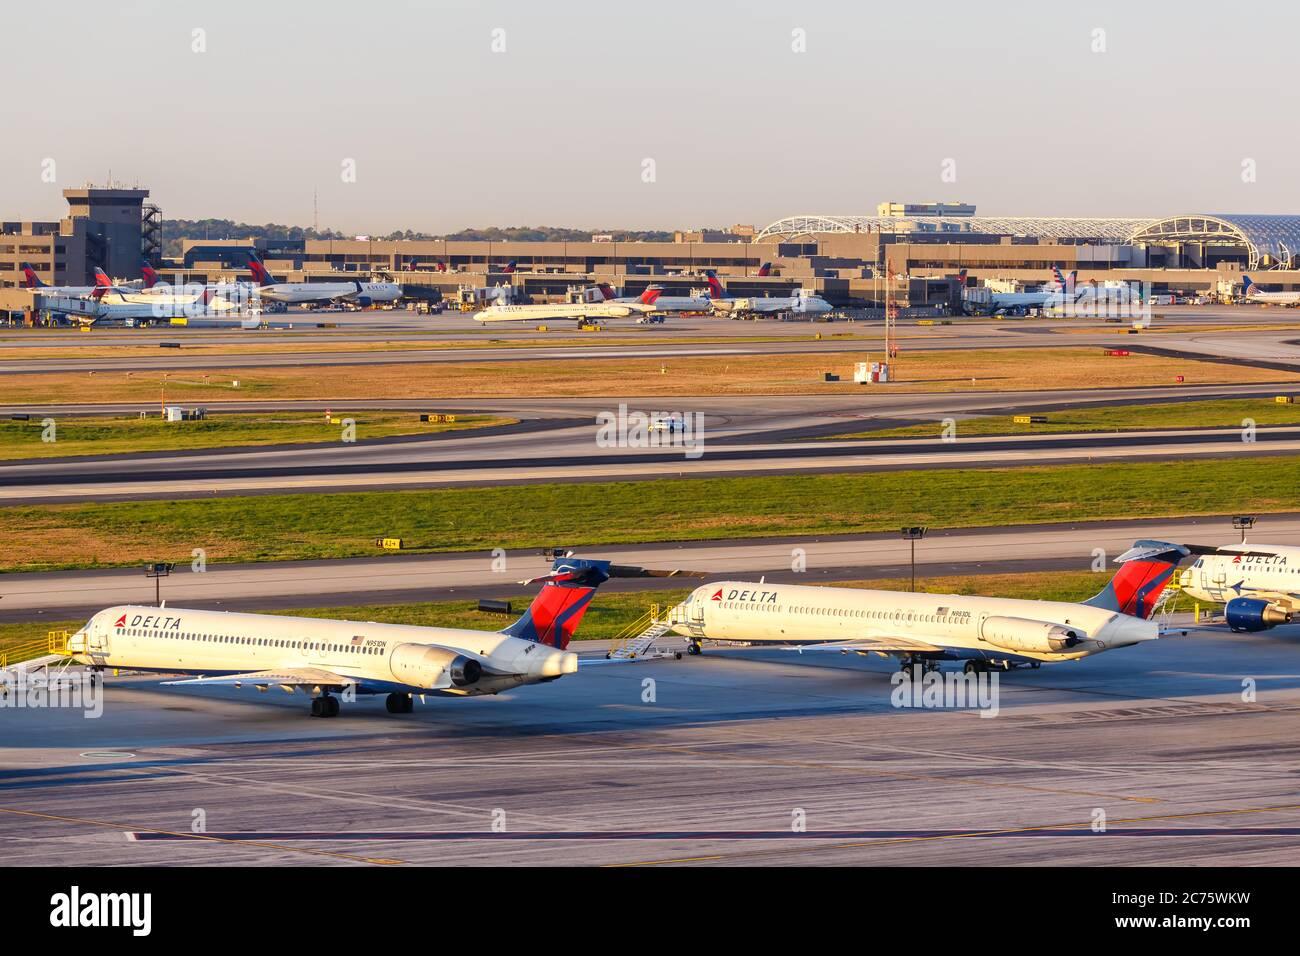 Atlanta, Georgia - April 3, 2019: Delta Air Lines McDonnell Douglas MD-90 airplane at Atlanta Airport (ATL) in Georgia. Stock Photo